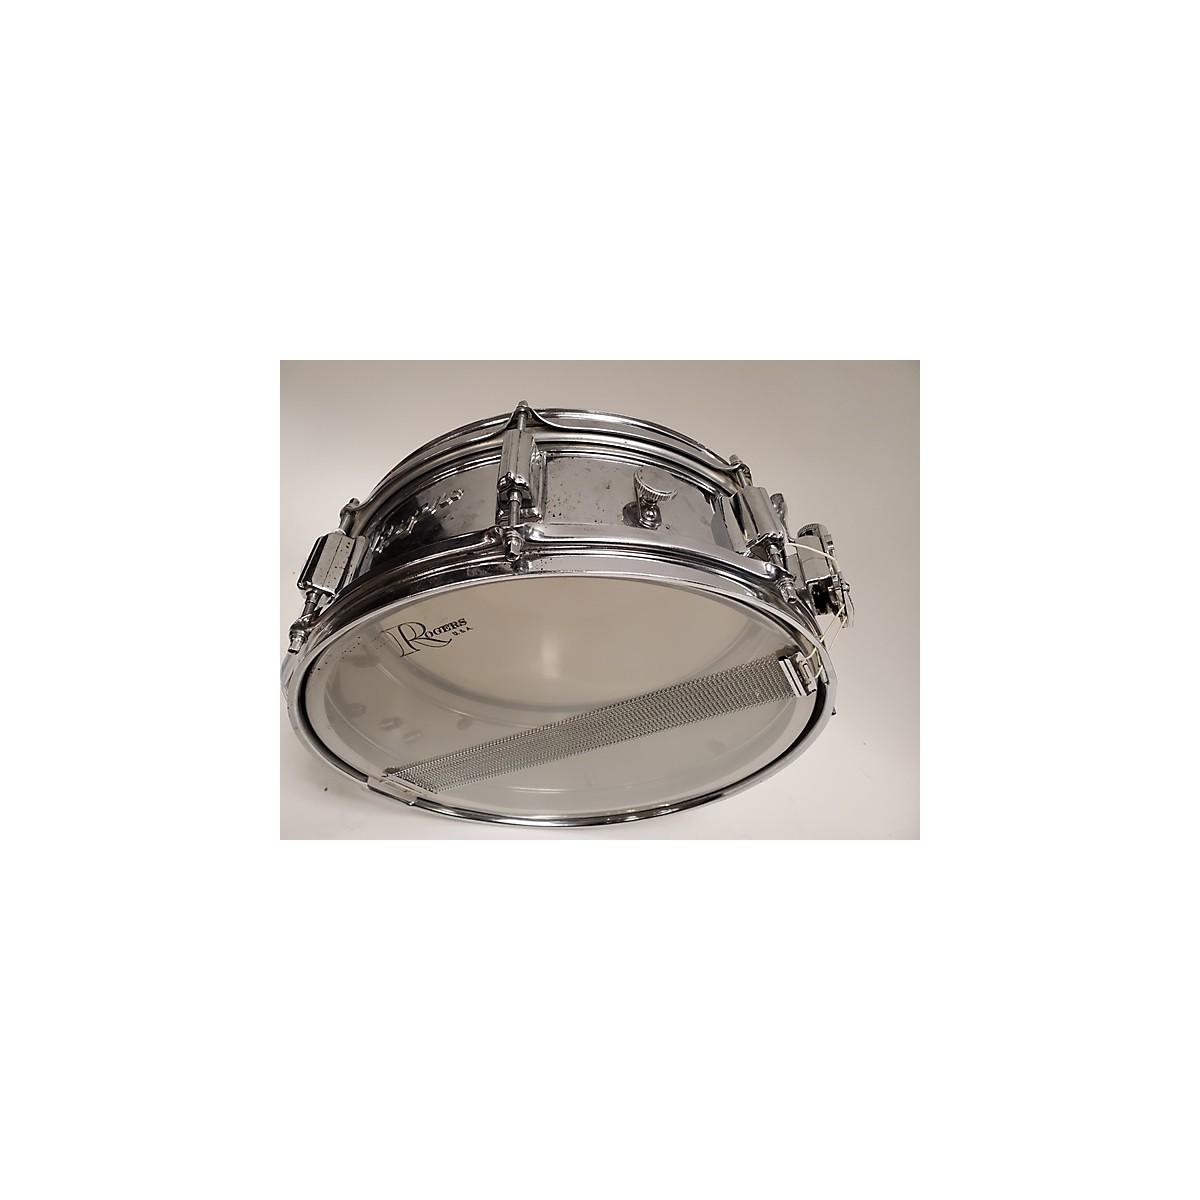 Rogers 1960s 14in Powertone Drum